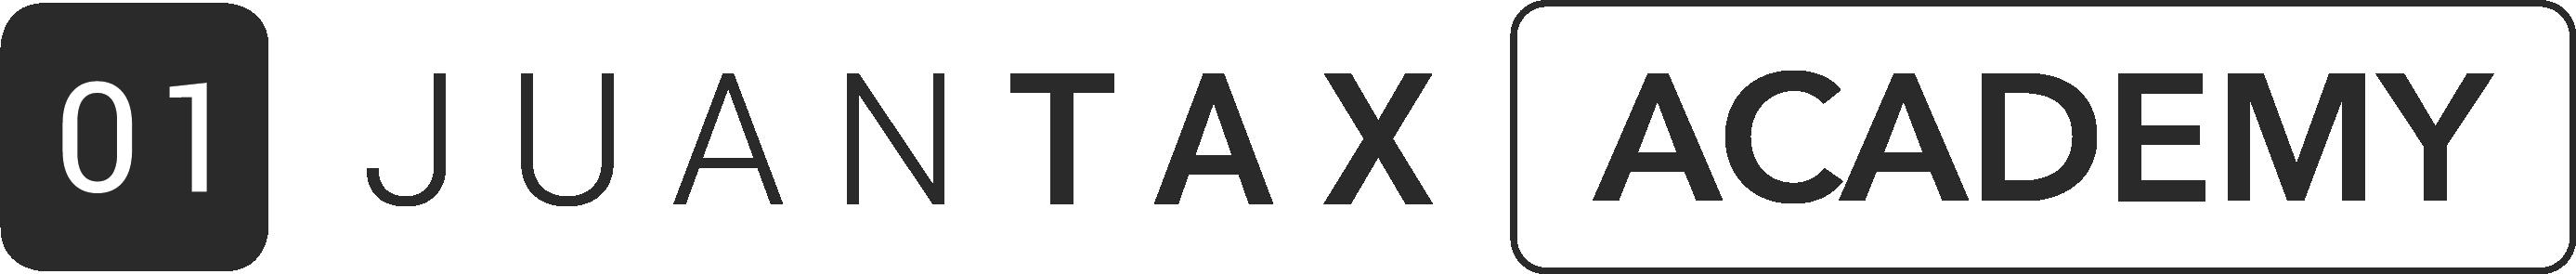 JuanTax Academy